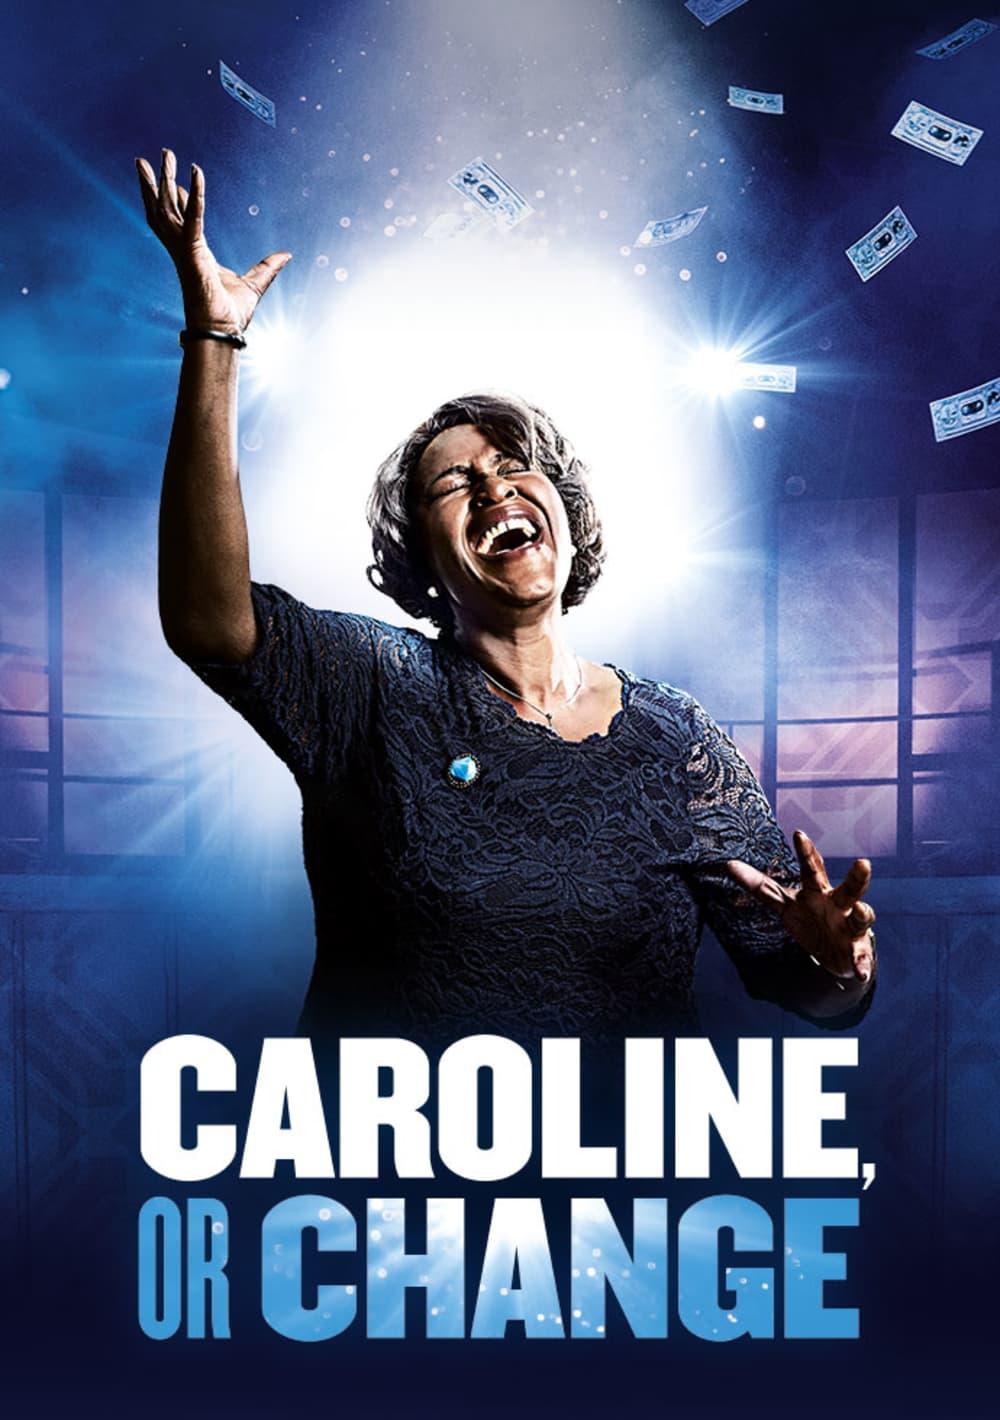 Caroline_Poster